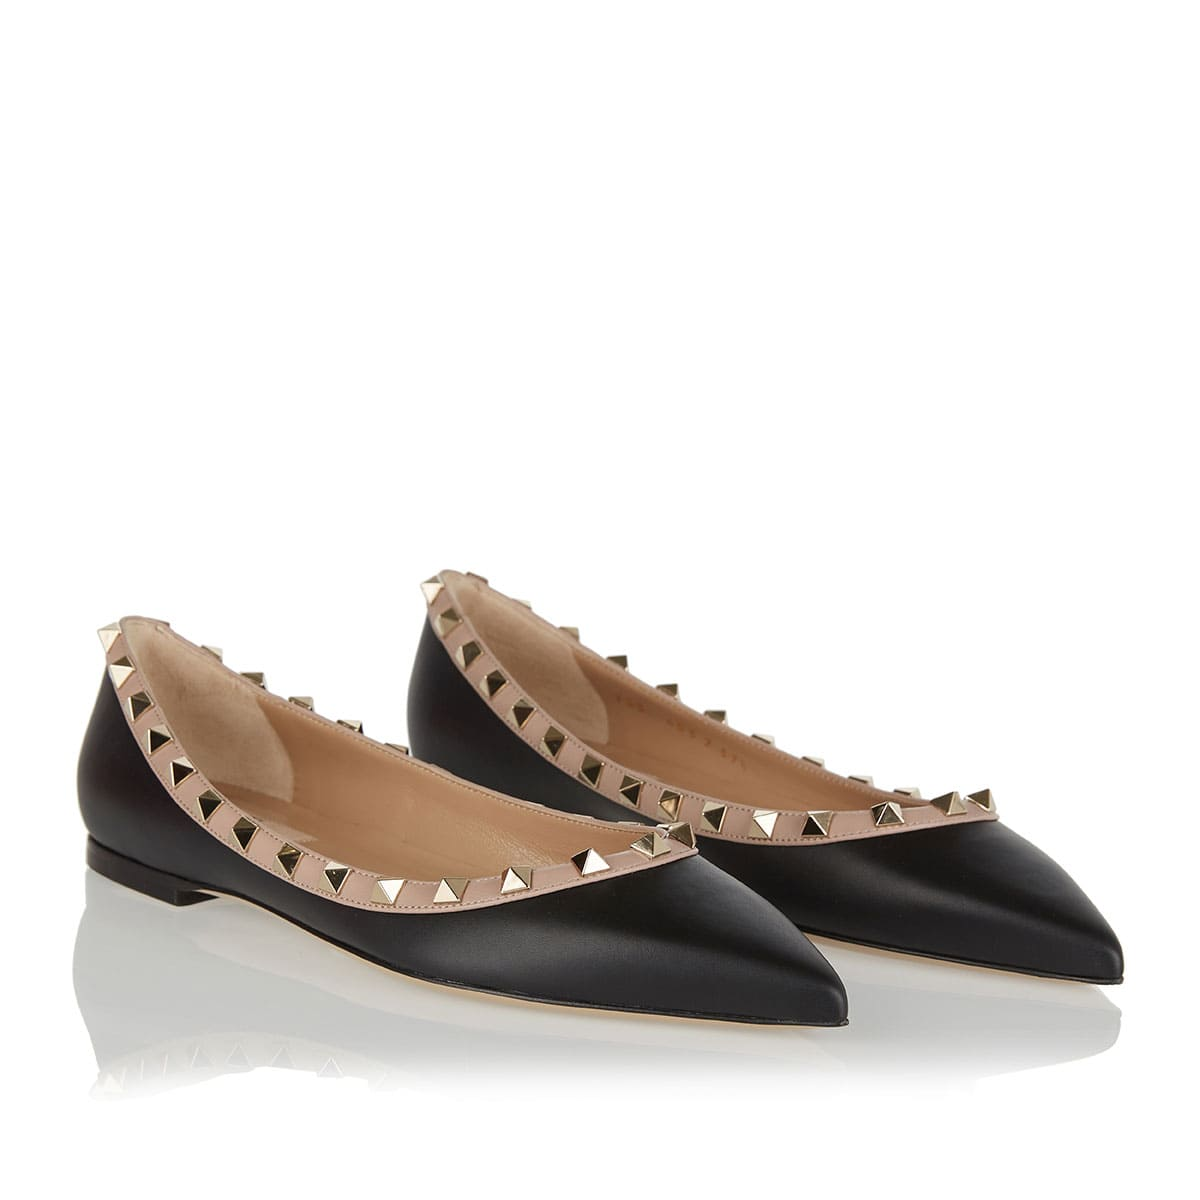 Rockstud leather flat shoes